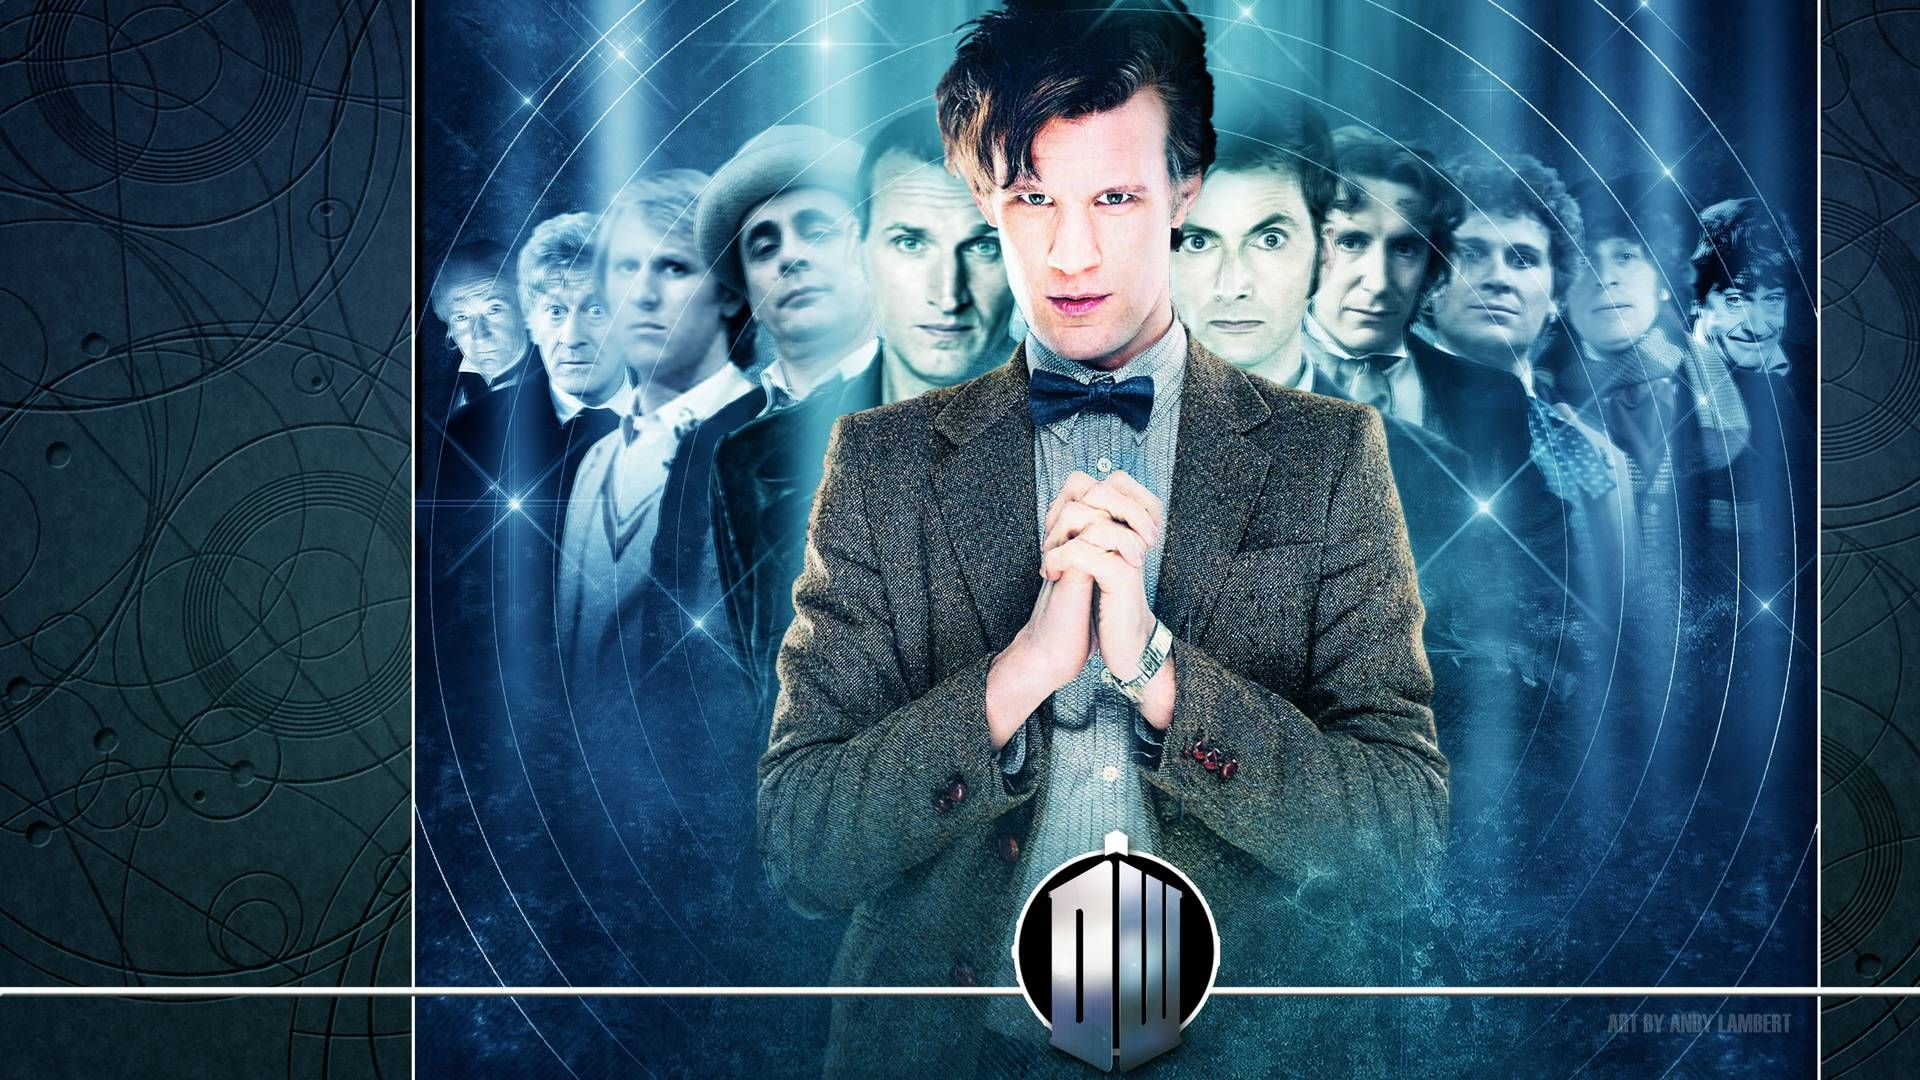 Doctor Who Fantasy Art Weeping Angels Wallpapers HD Desktop